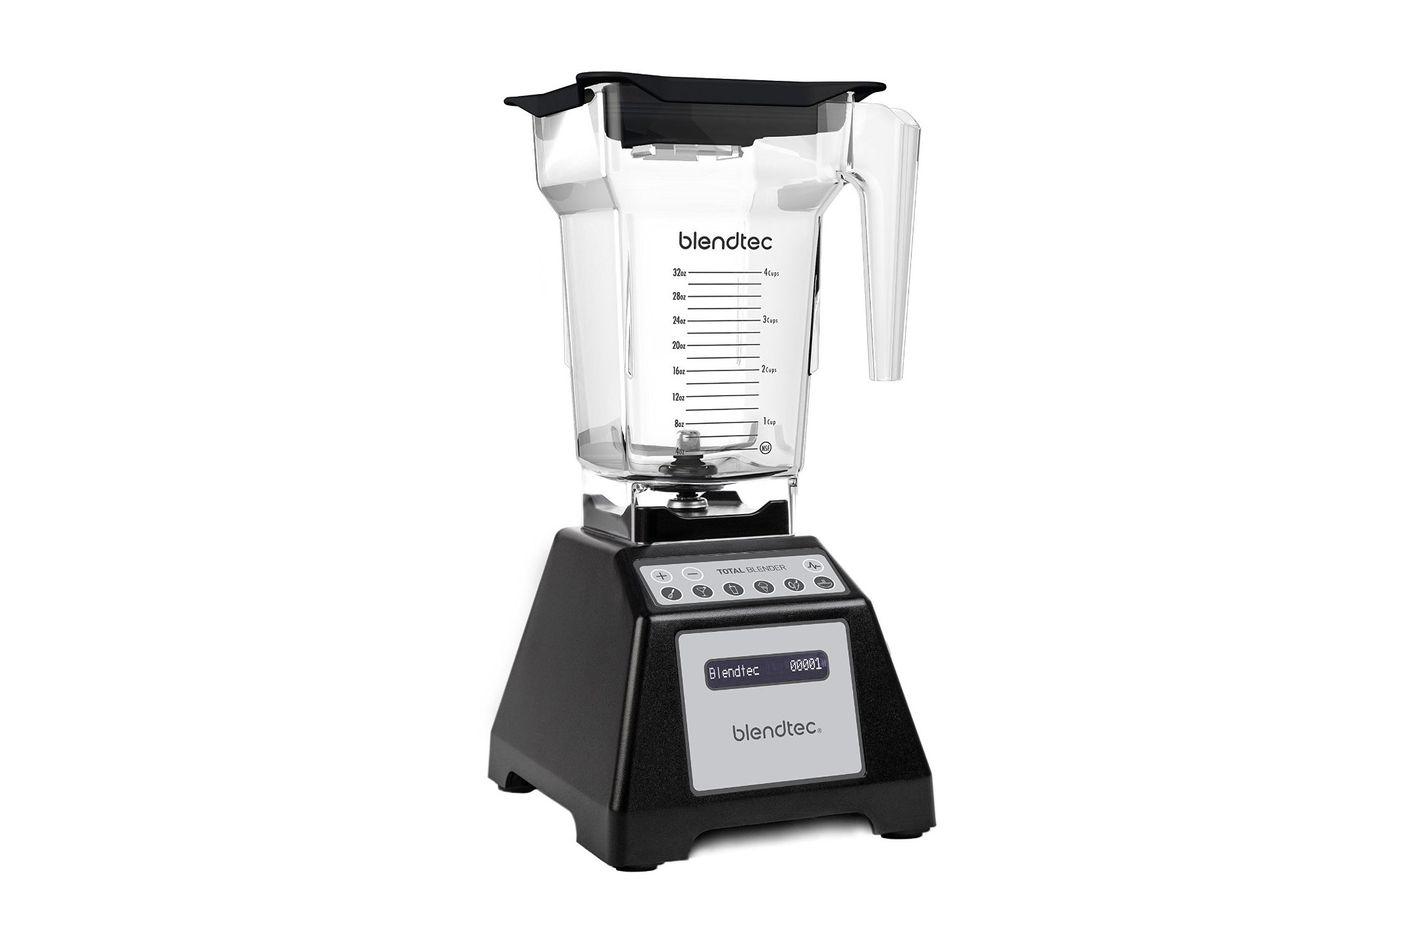 The Best Cyber Monday Kitchen Deal 2017 Is a Vitamix Blender